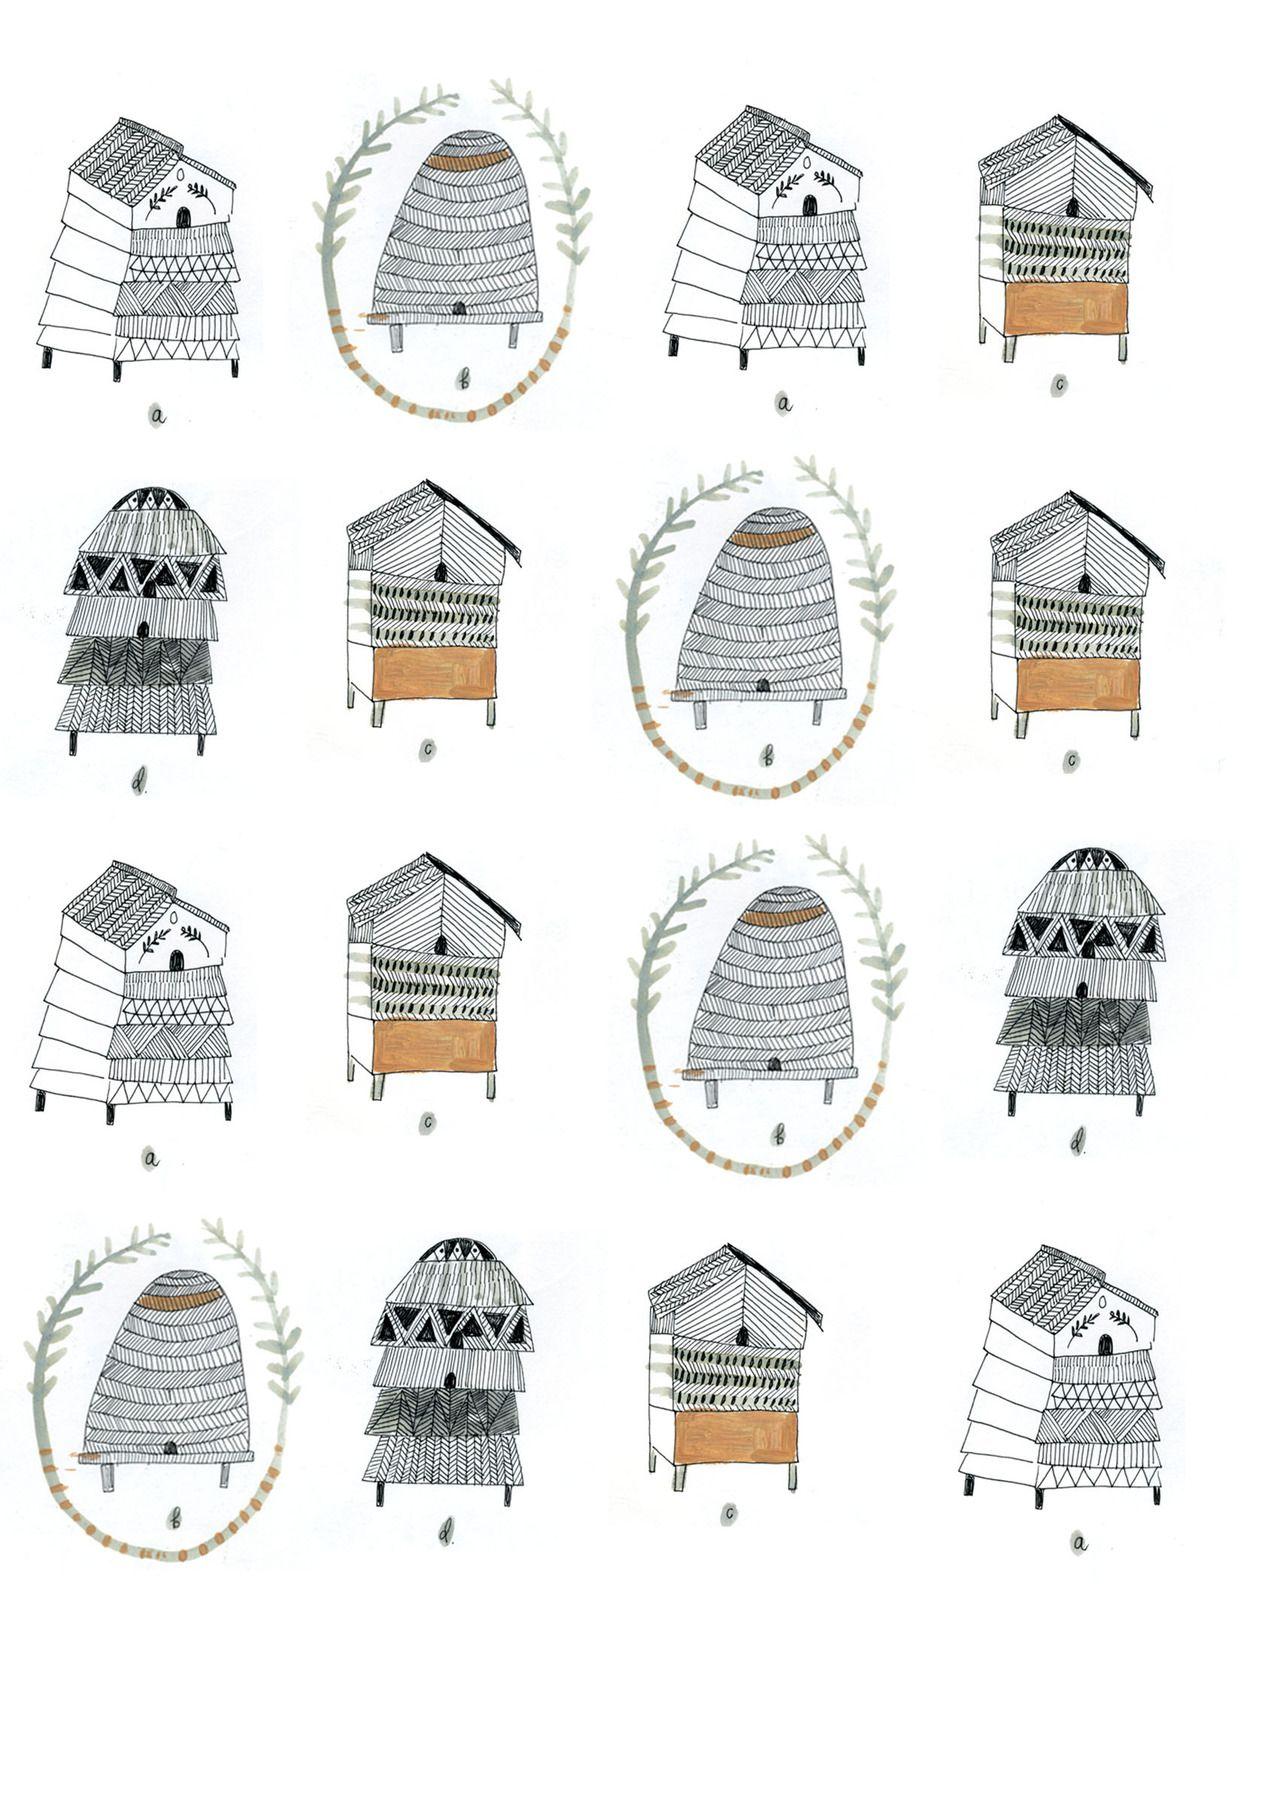 Beehive Patterns Katt Frank